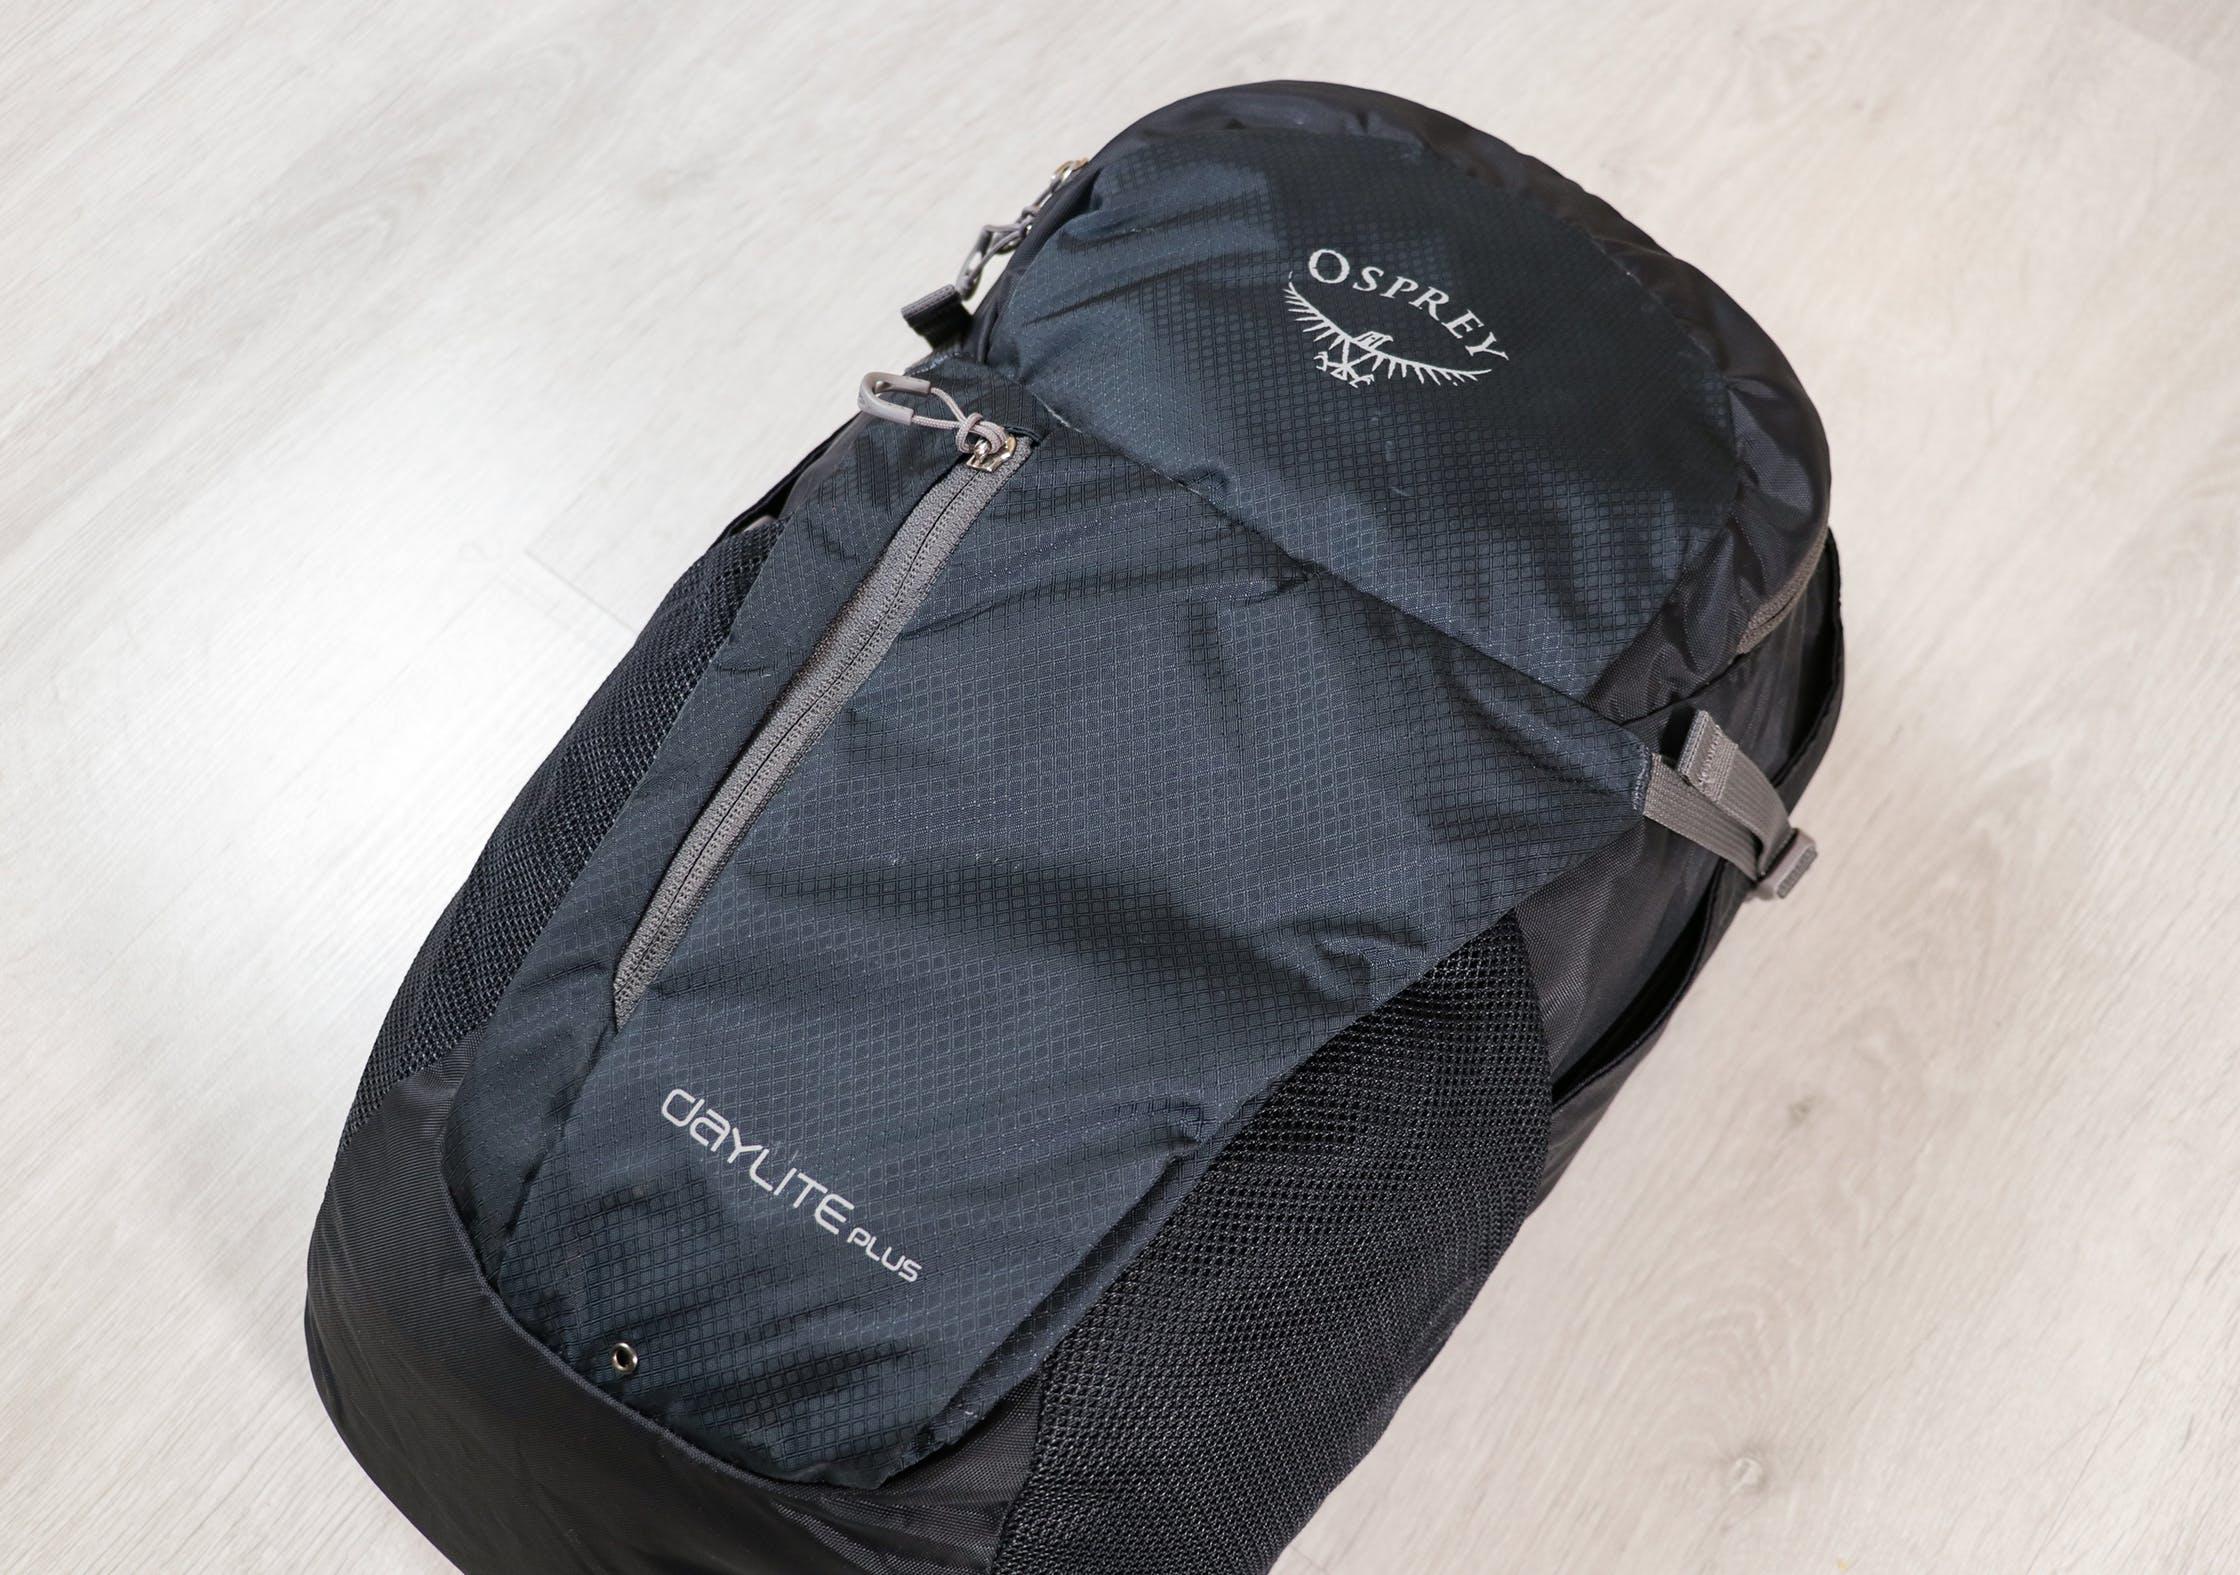 Osprey Daylite Plus Branding